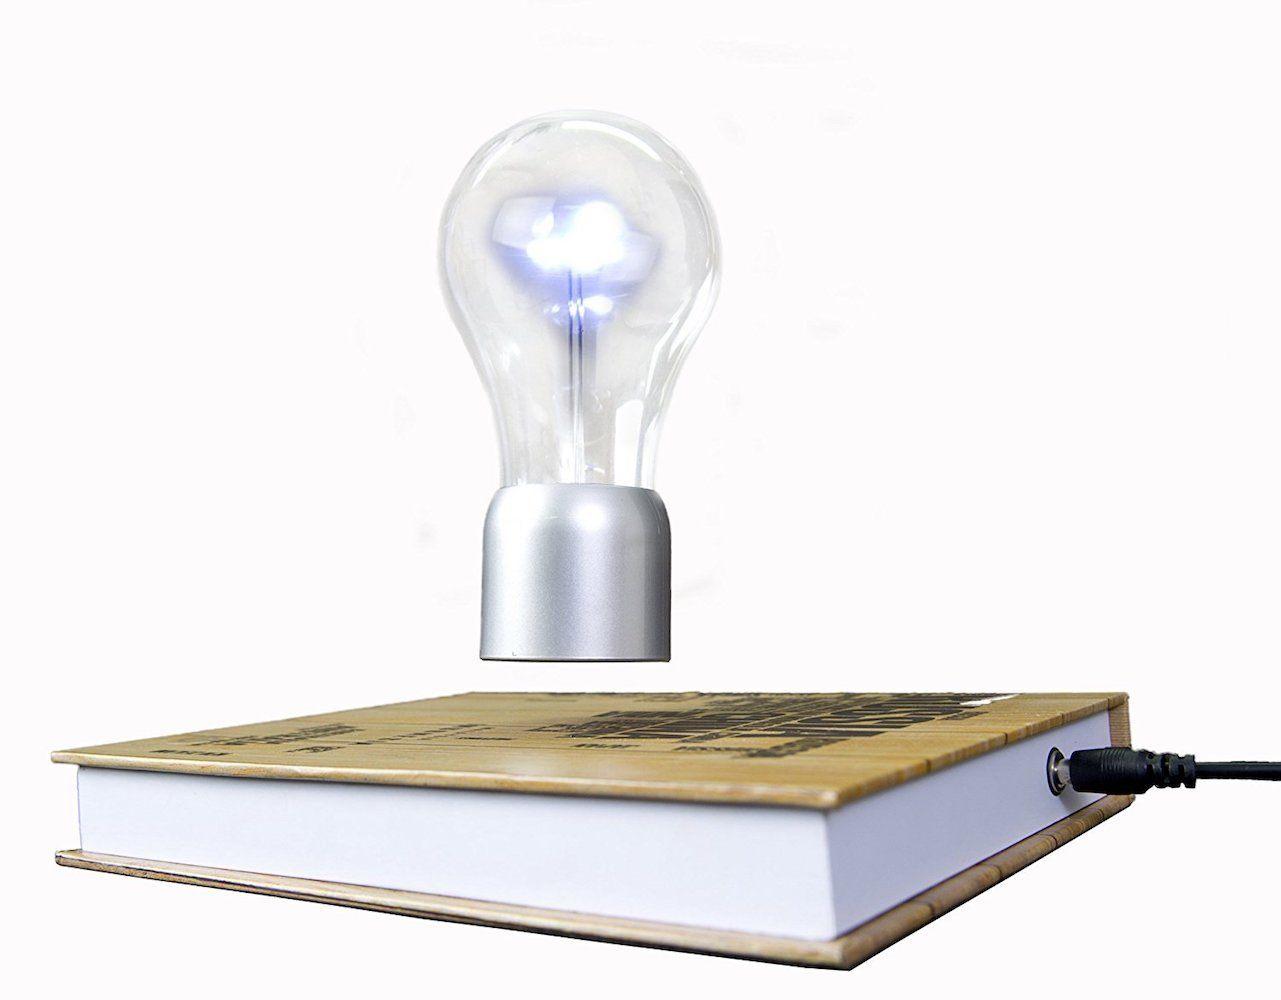 spaceb-levitating-light-bulb-lamp-04